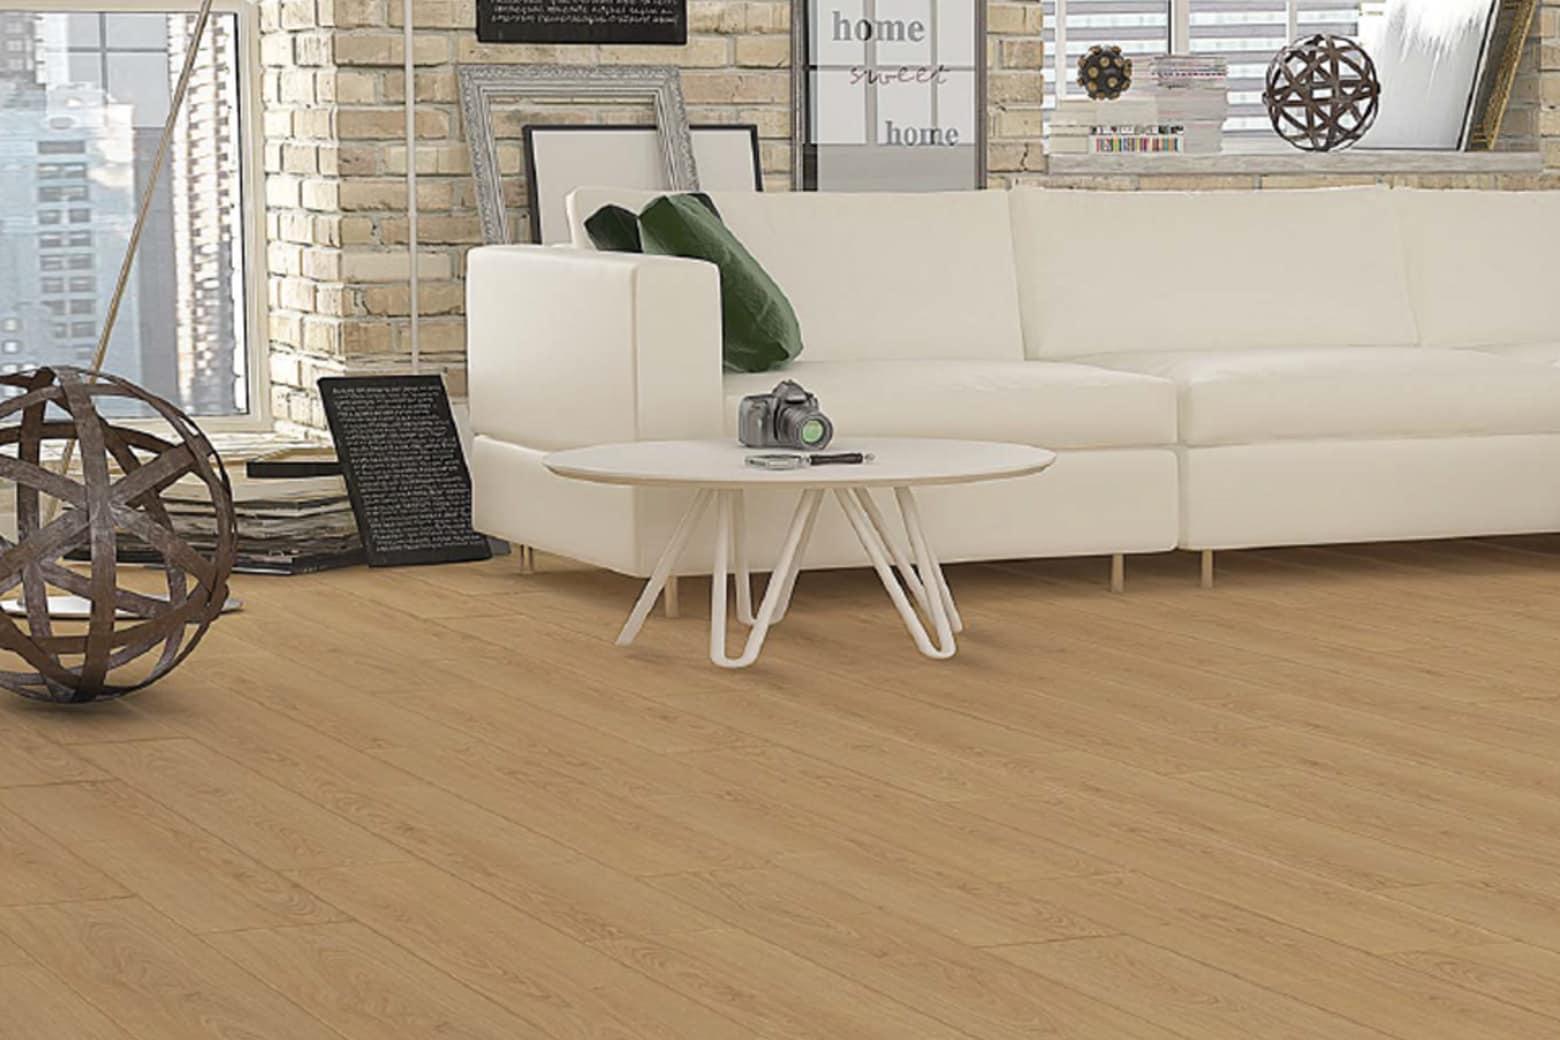 Peking Natural Oak Laminate Flooring 8mm By 197mm By 1205mm